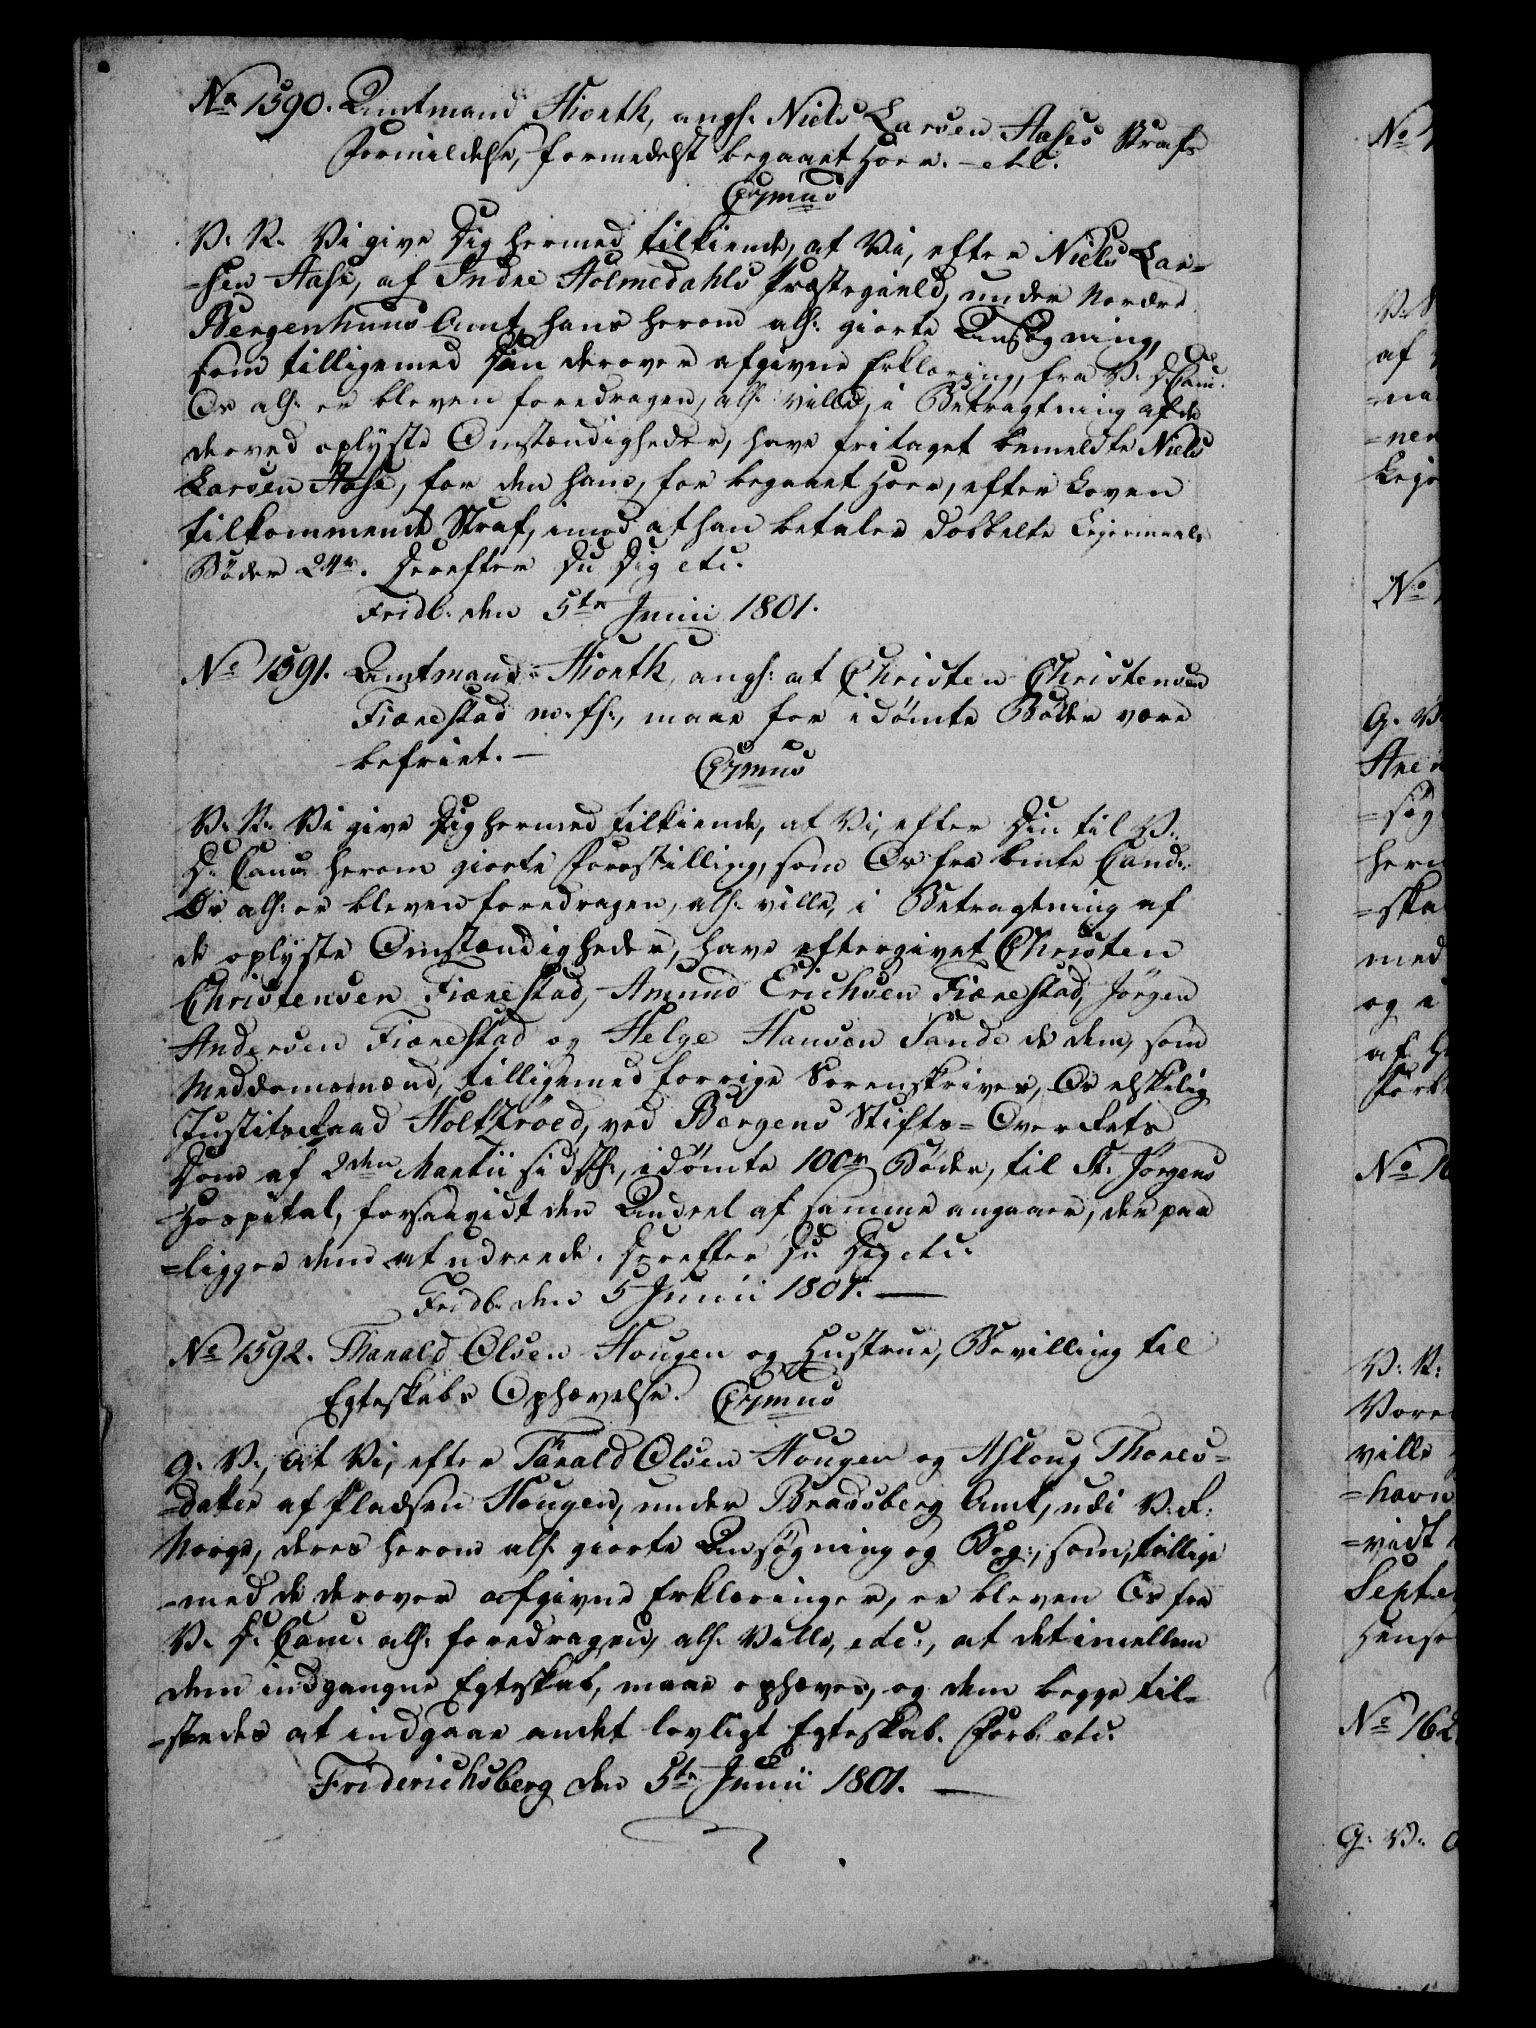 RA, Danske Kanselli 1800-1814, H/Hf/Hfb/Hfba/L0001: Registranter, 1800-1801, s. 480b